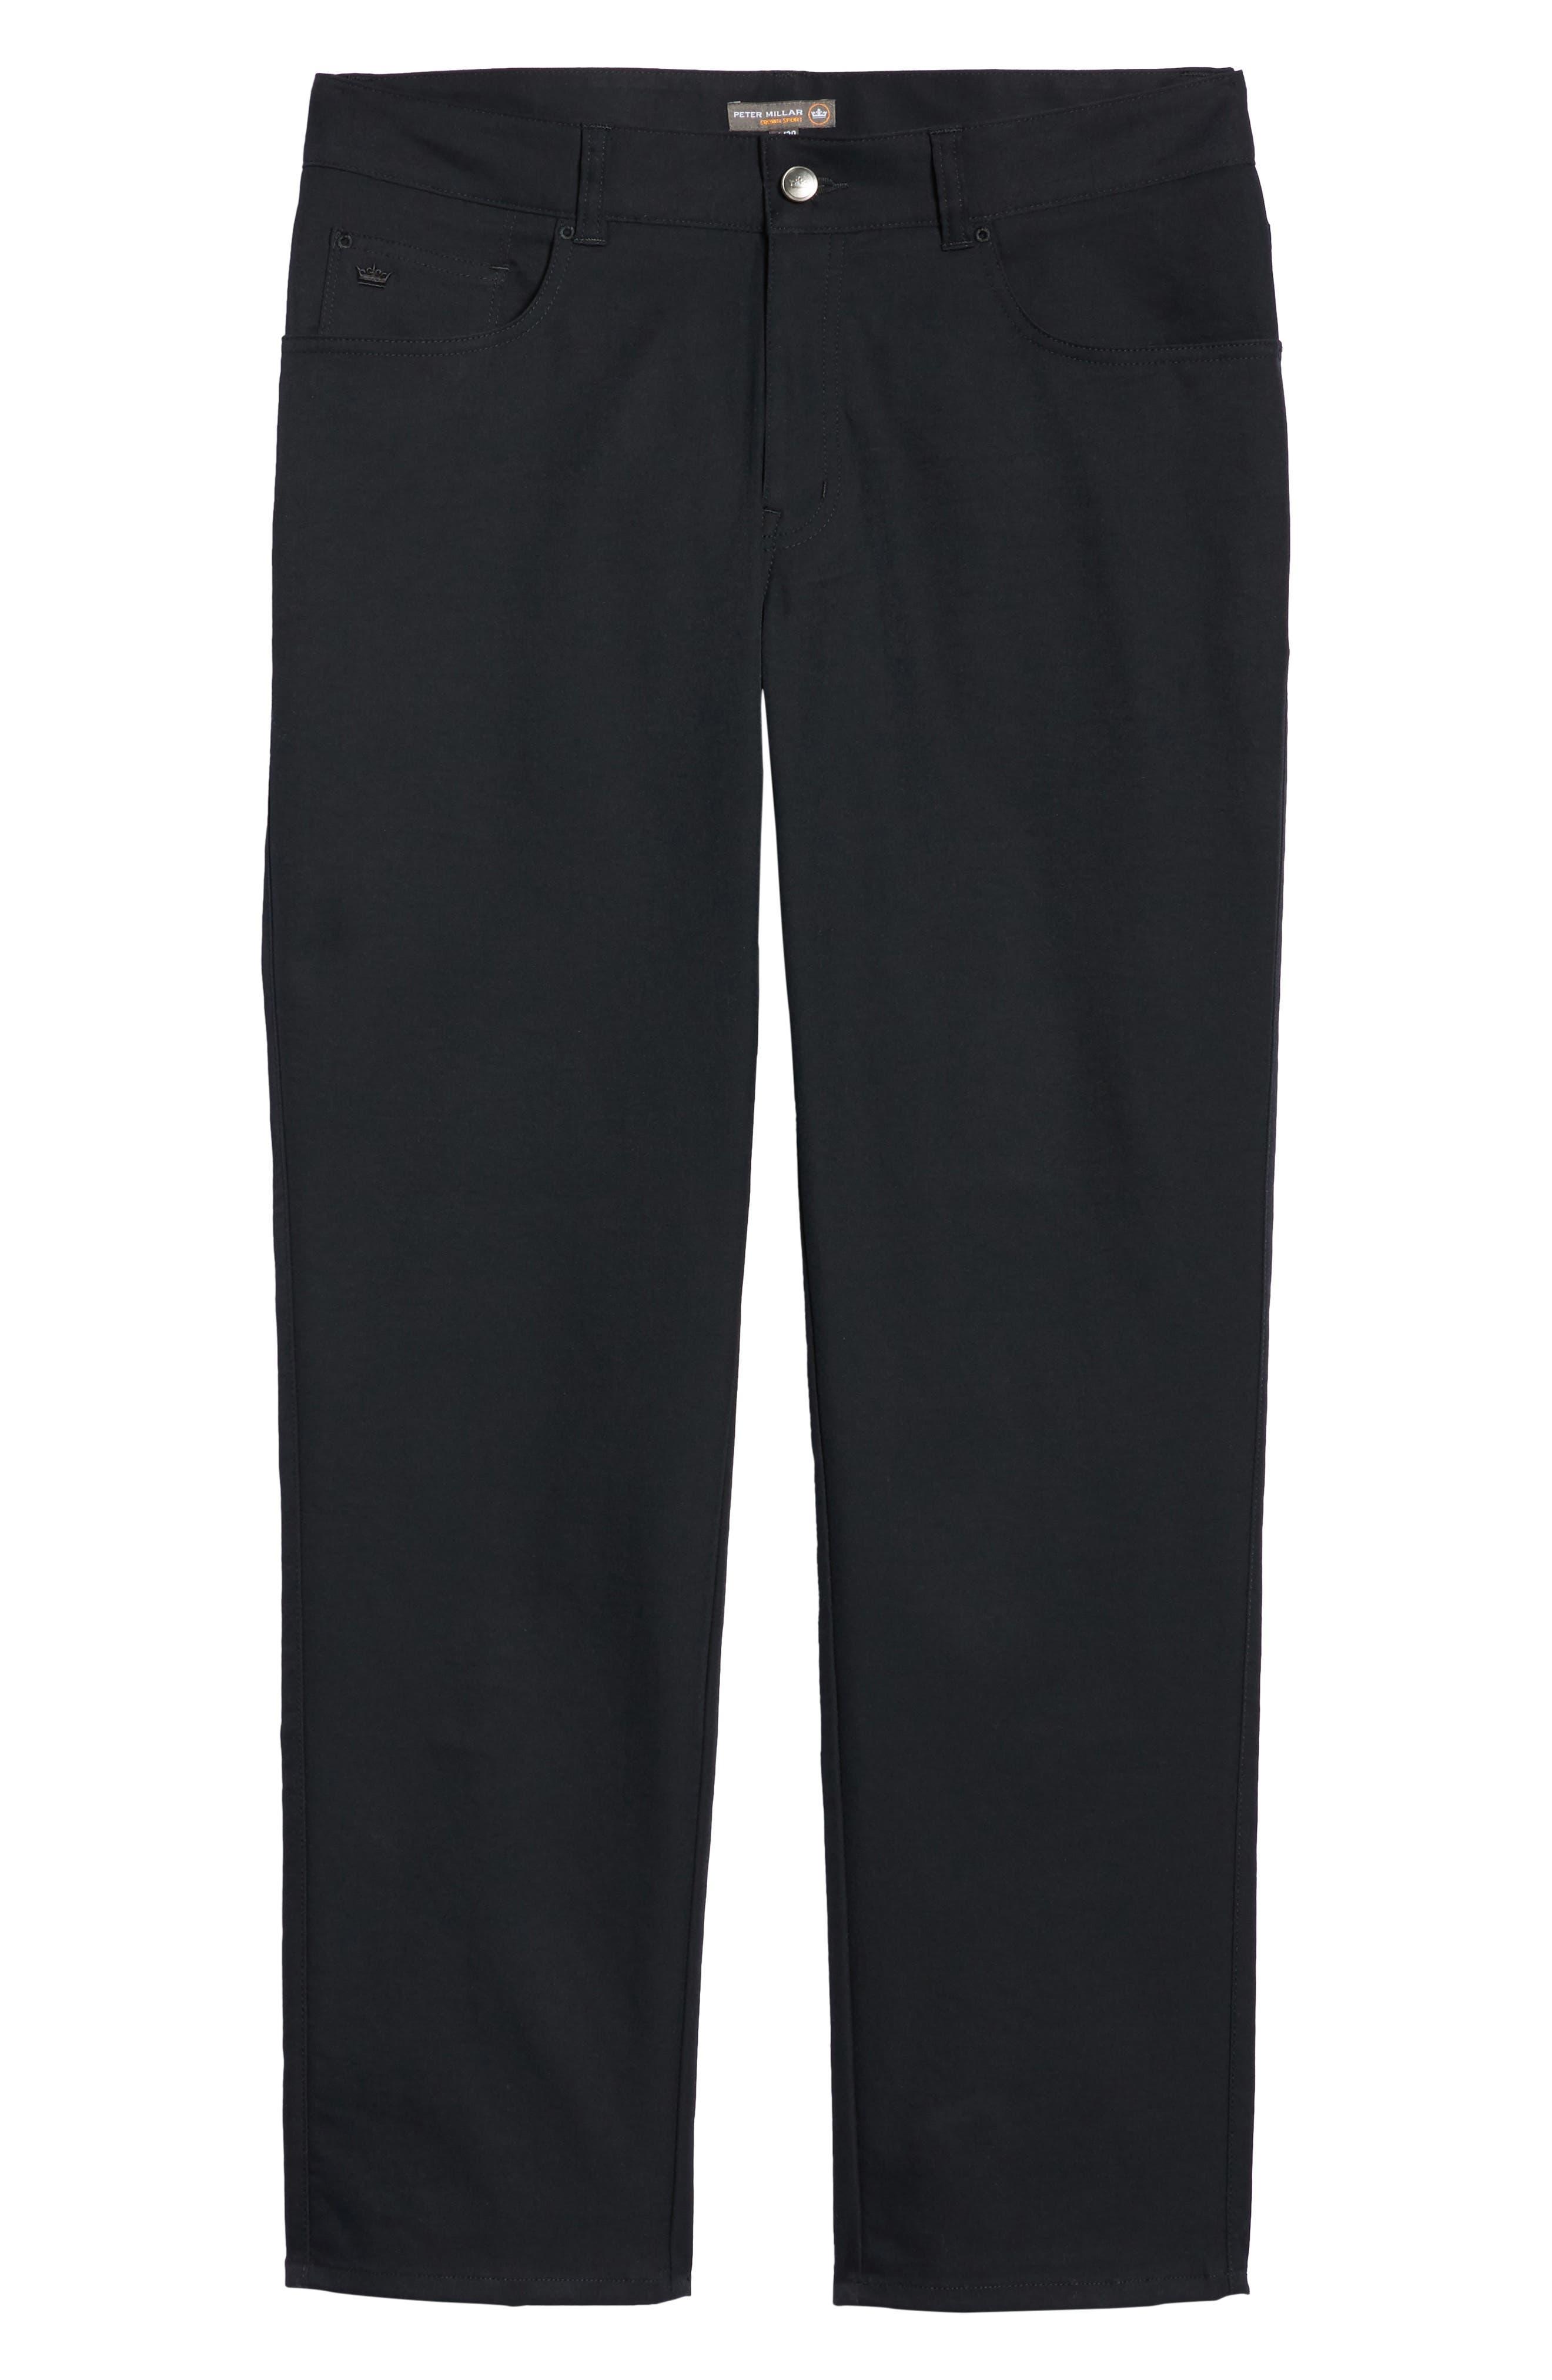 EB66 Performance Six-Pocket Pants,                             Alternate thumbnail 6, color,                             001